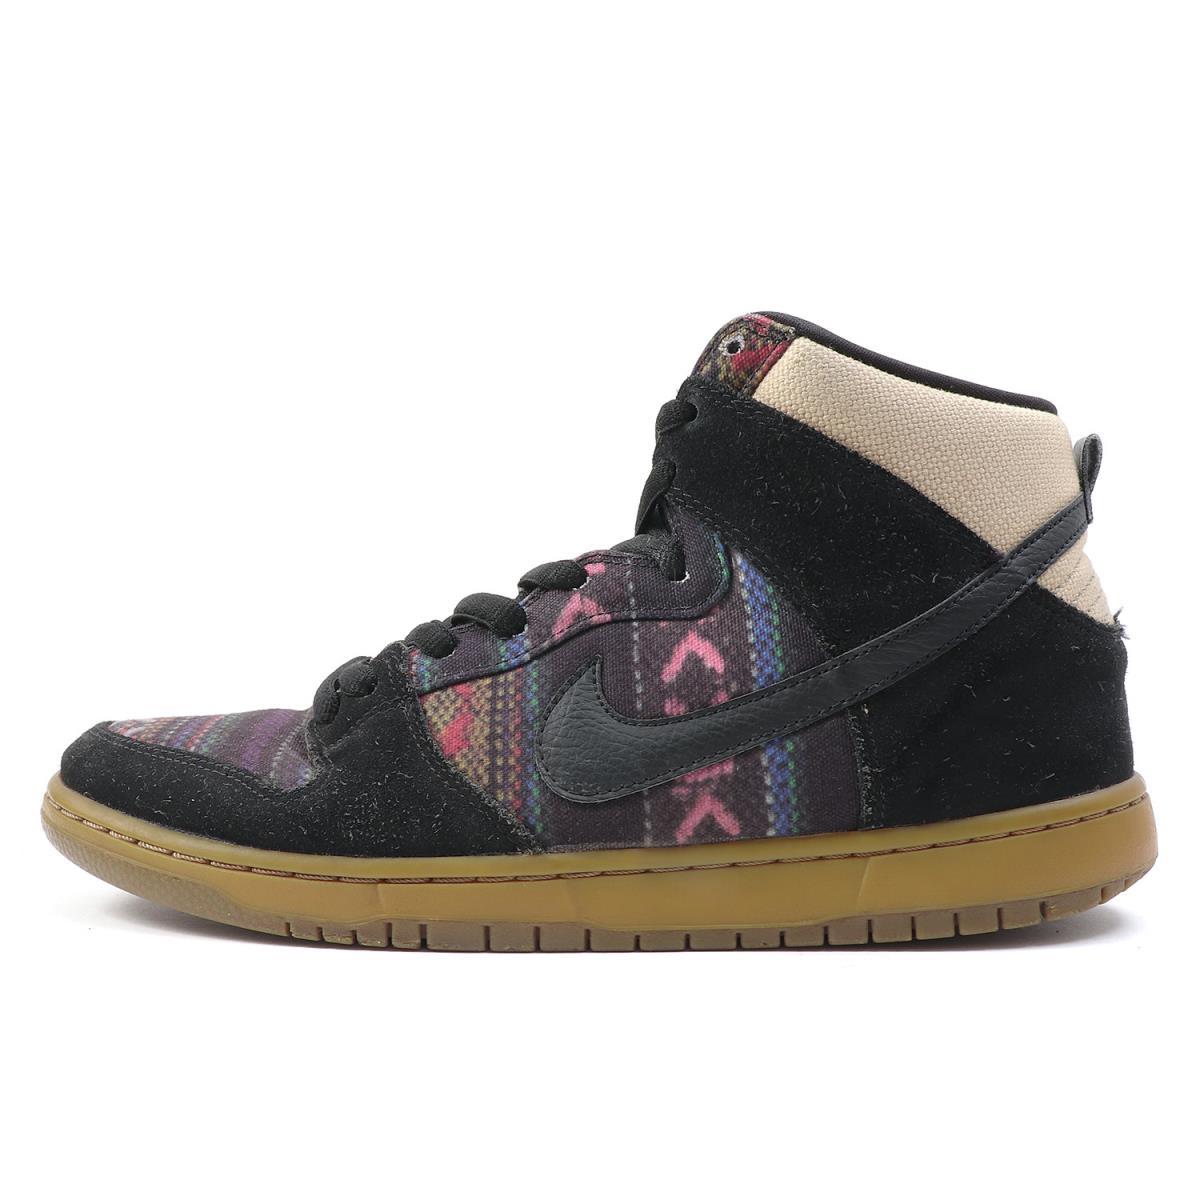 sale retailer b9b26 bfea3 NIKE (Nike) DUNK HIGH PREMIUM SB HACKY SACK (313,171-902) black  US10.5(28.5cm)